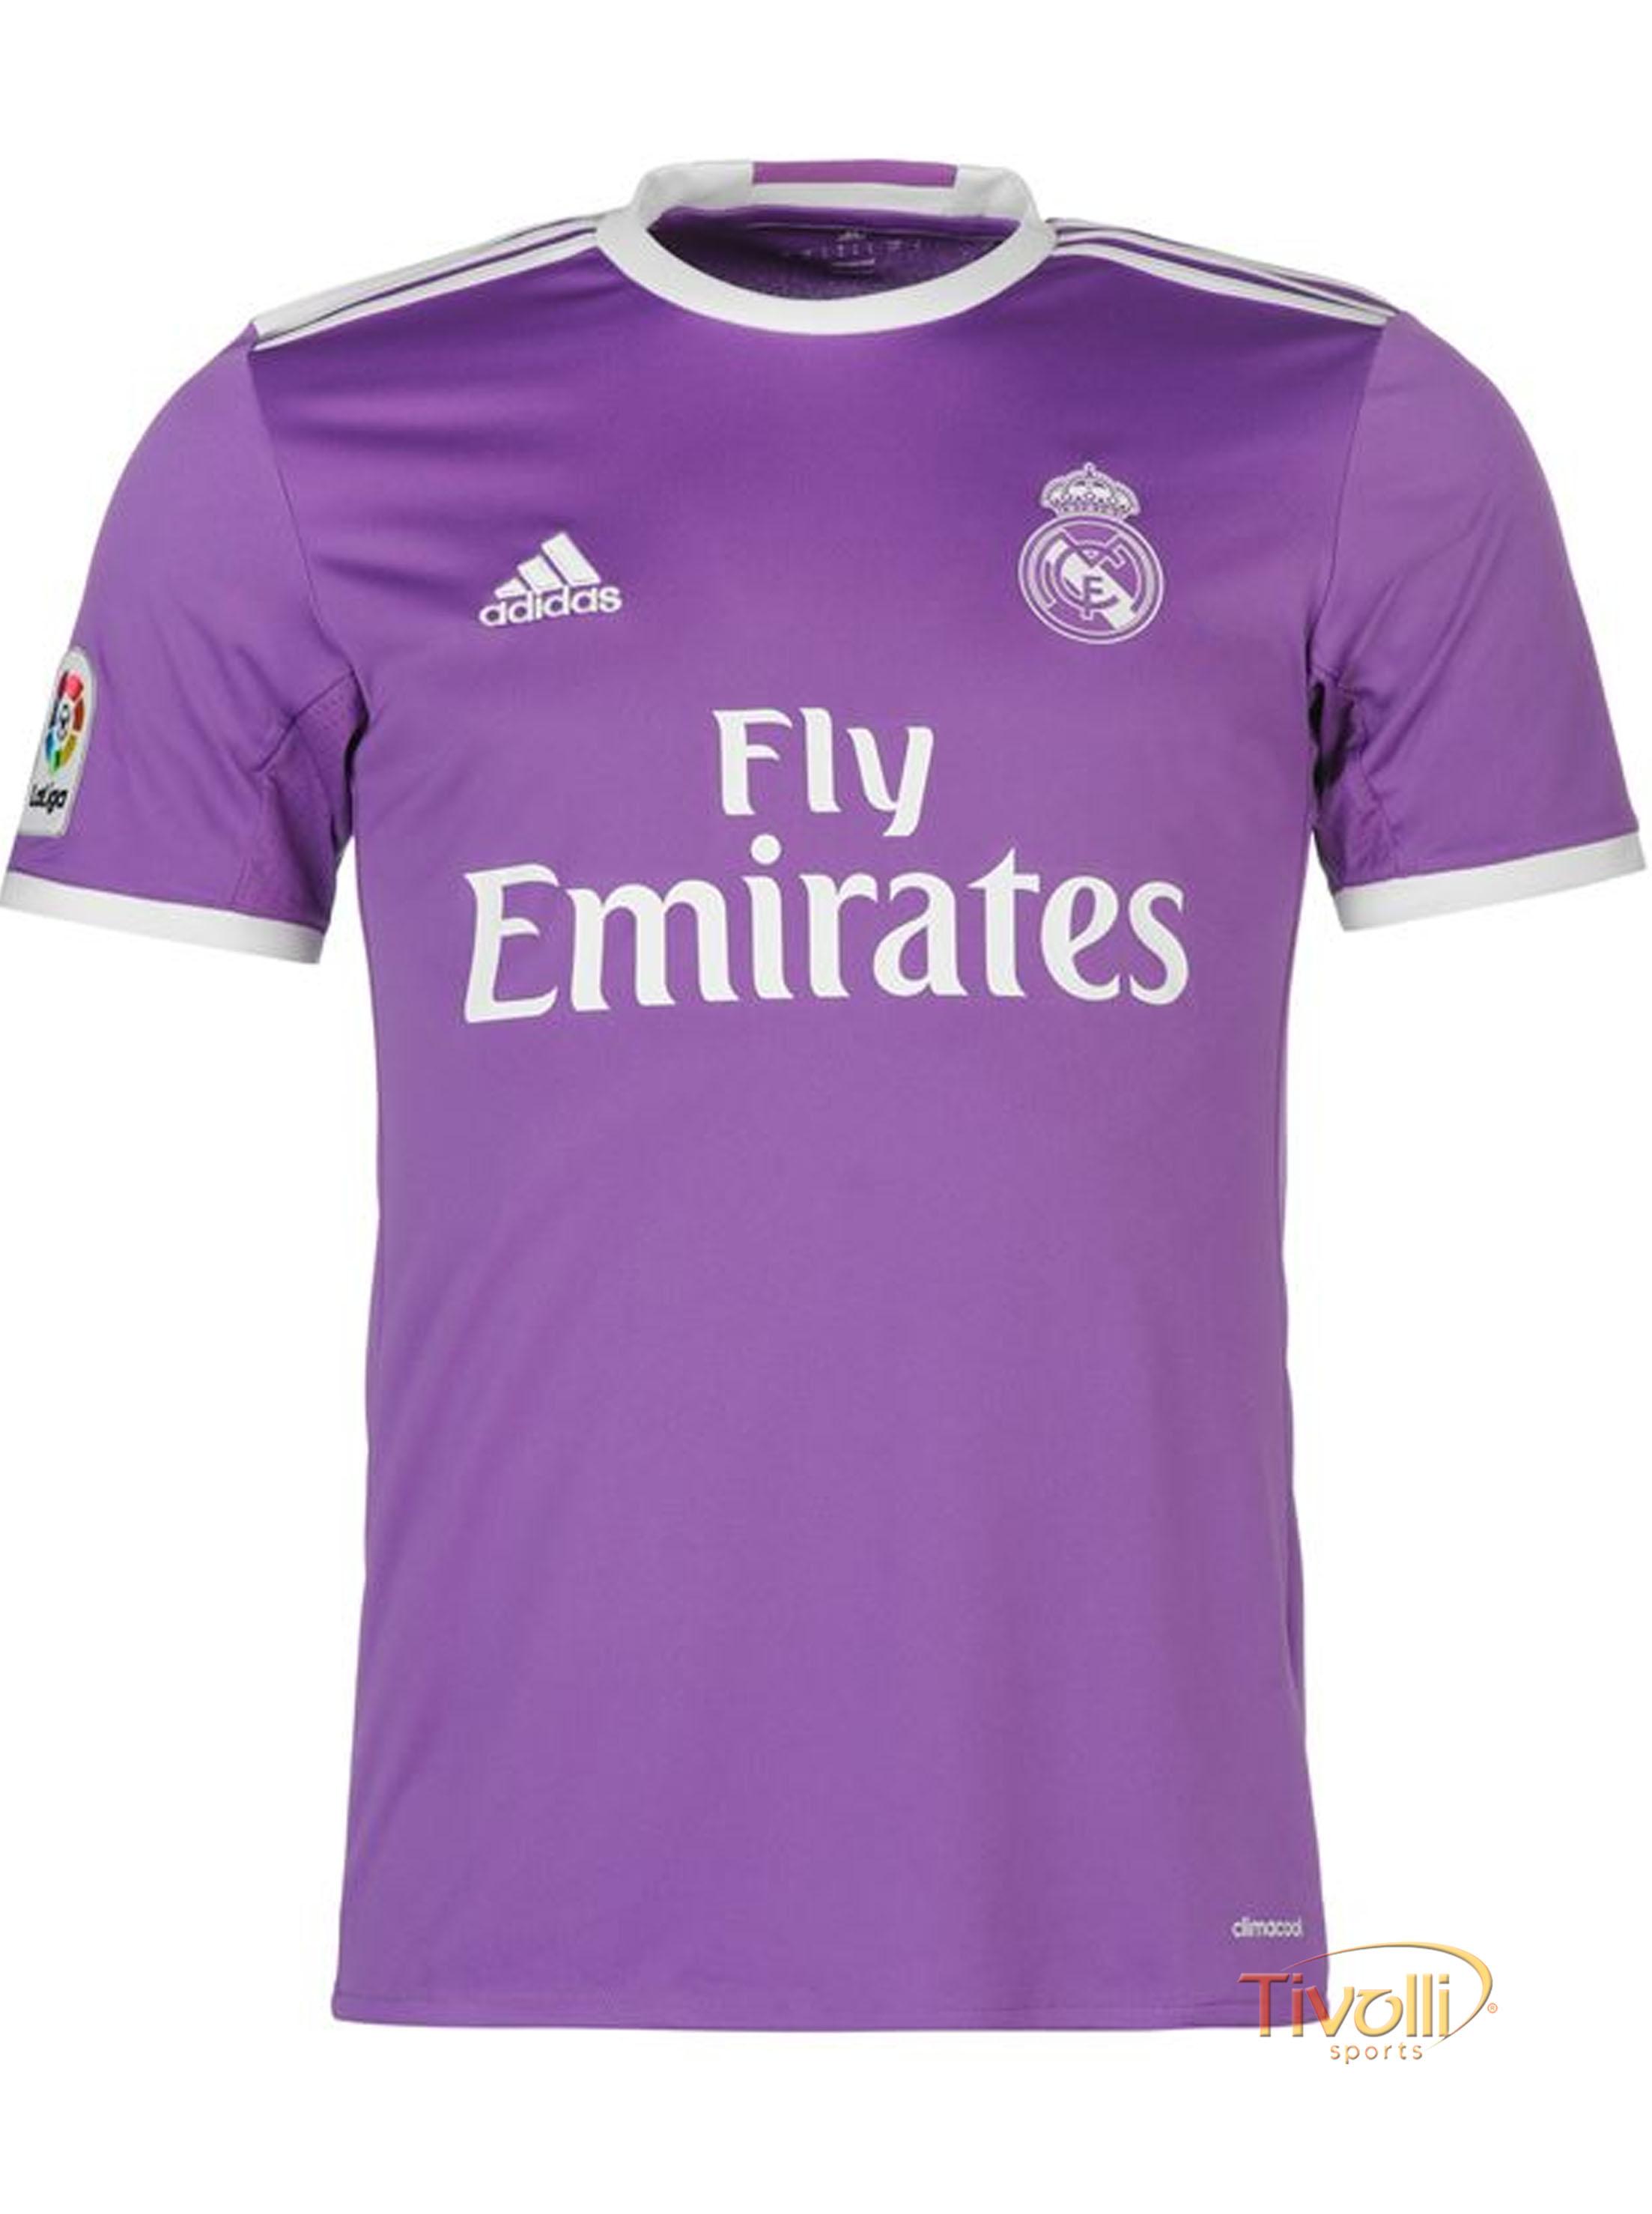 Camisa Real Madrid II Away 2016 17 Adidas Infantil   - Mega Saldão   681eae9e488fe